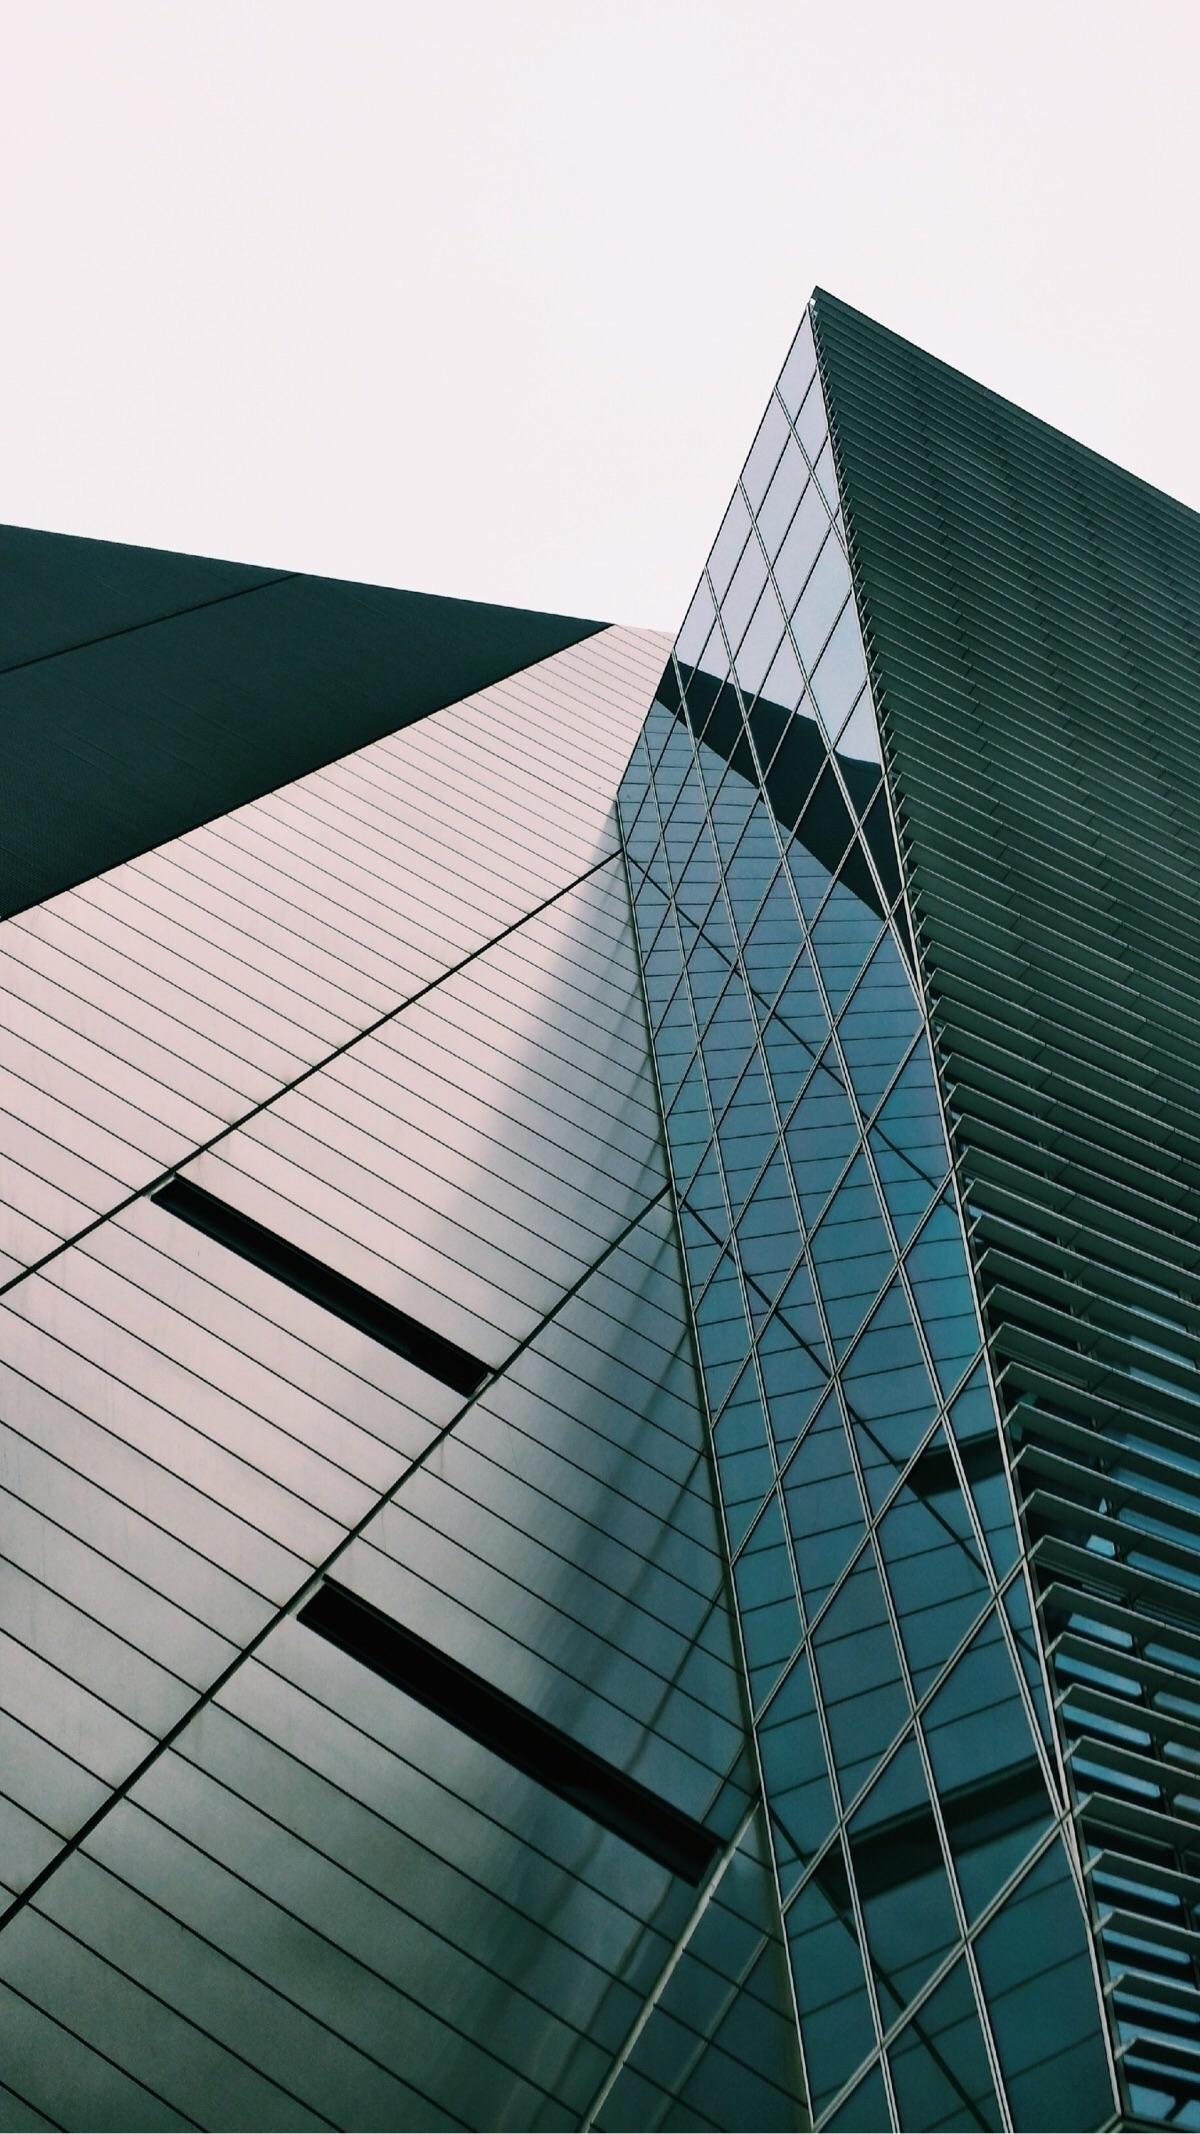 Dublin, Ireland - dublin, architecture - jaimelopezdesign | ello